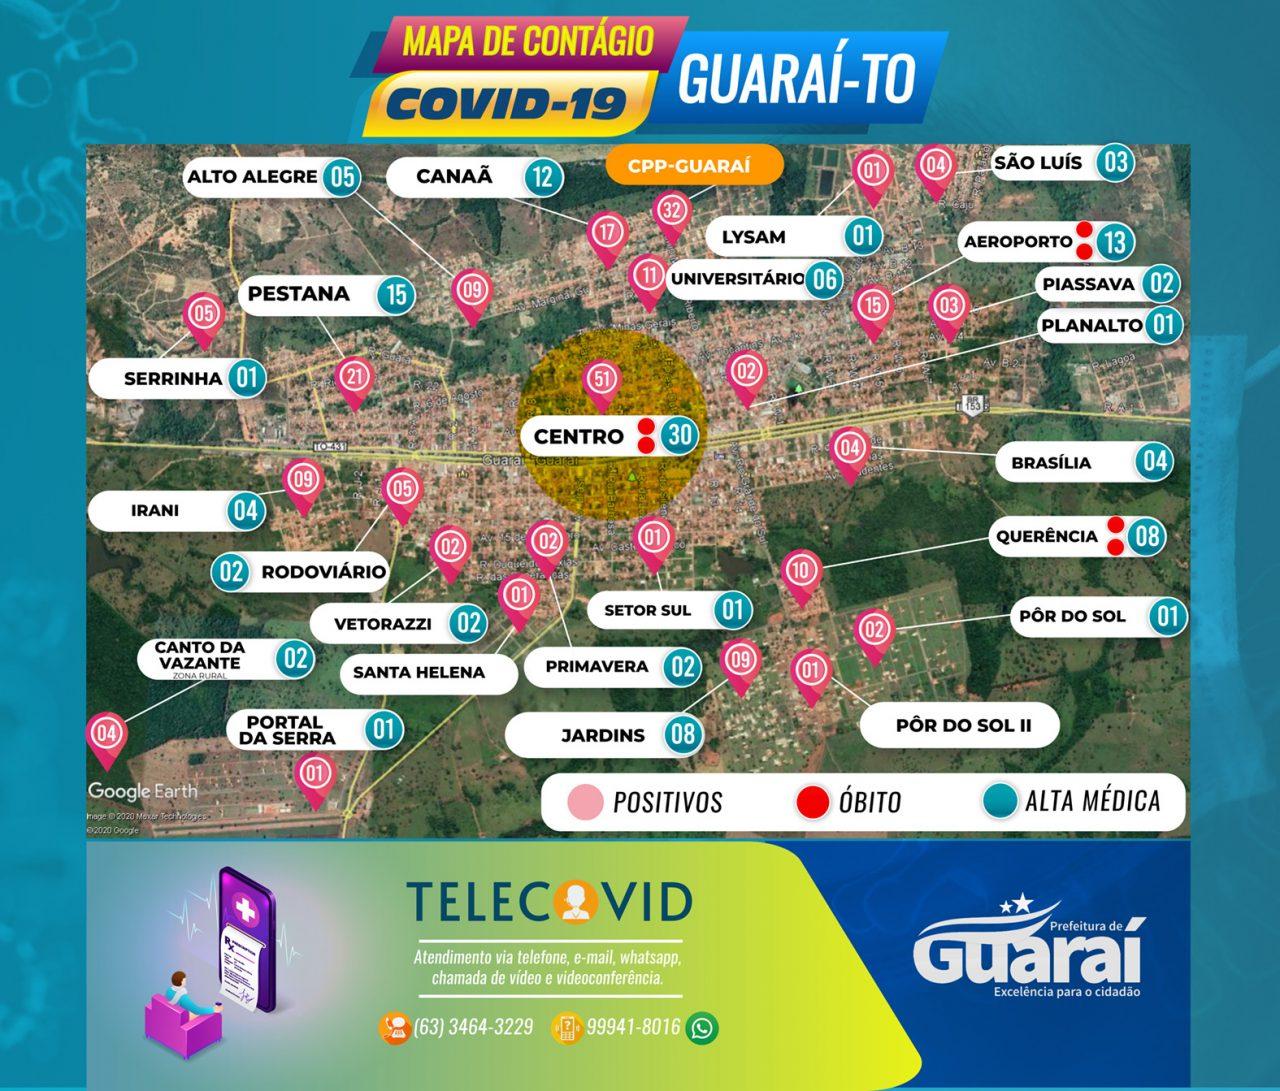 MAPA GUARAI COVID19 2 DE JULHO QUINTA 1280x1091 - Painel Guaraí-TO / Covid-19 / Boletim 02 de Julho (quinta) 12:00